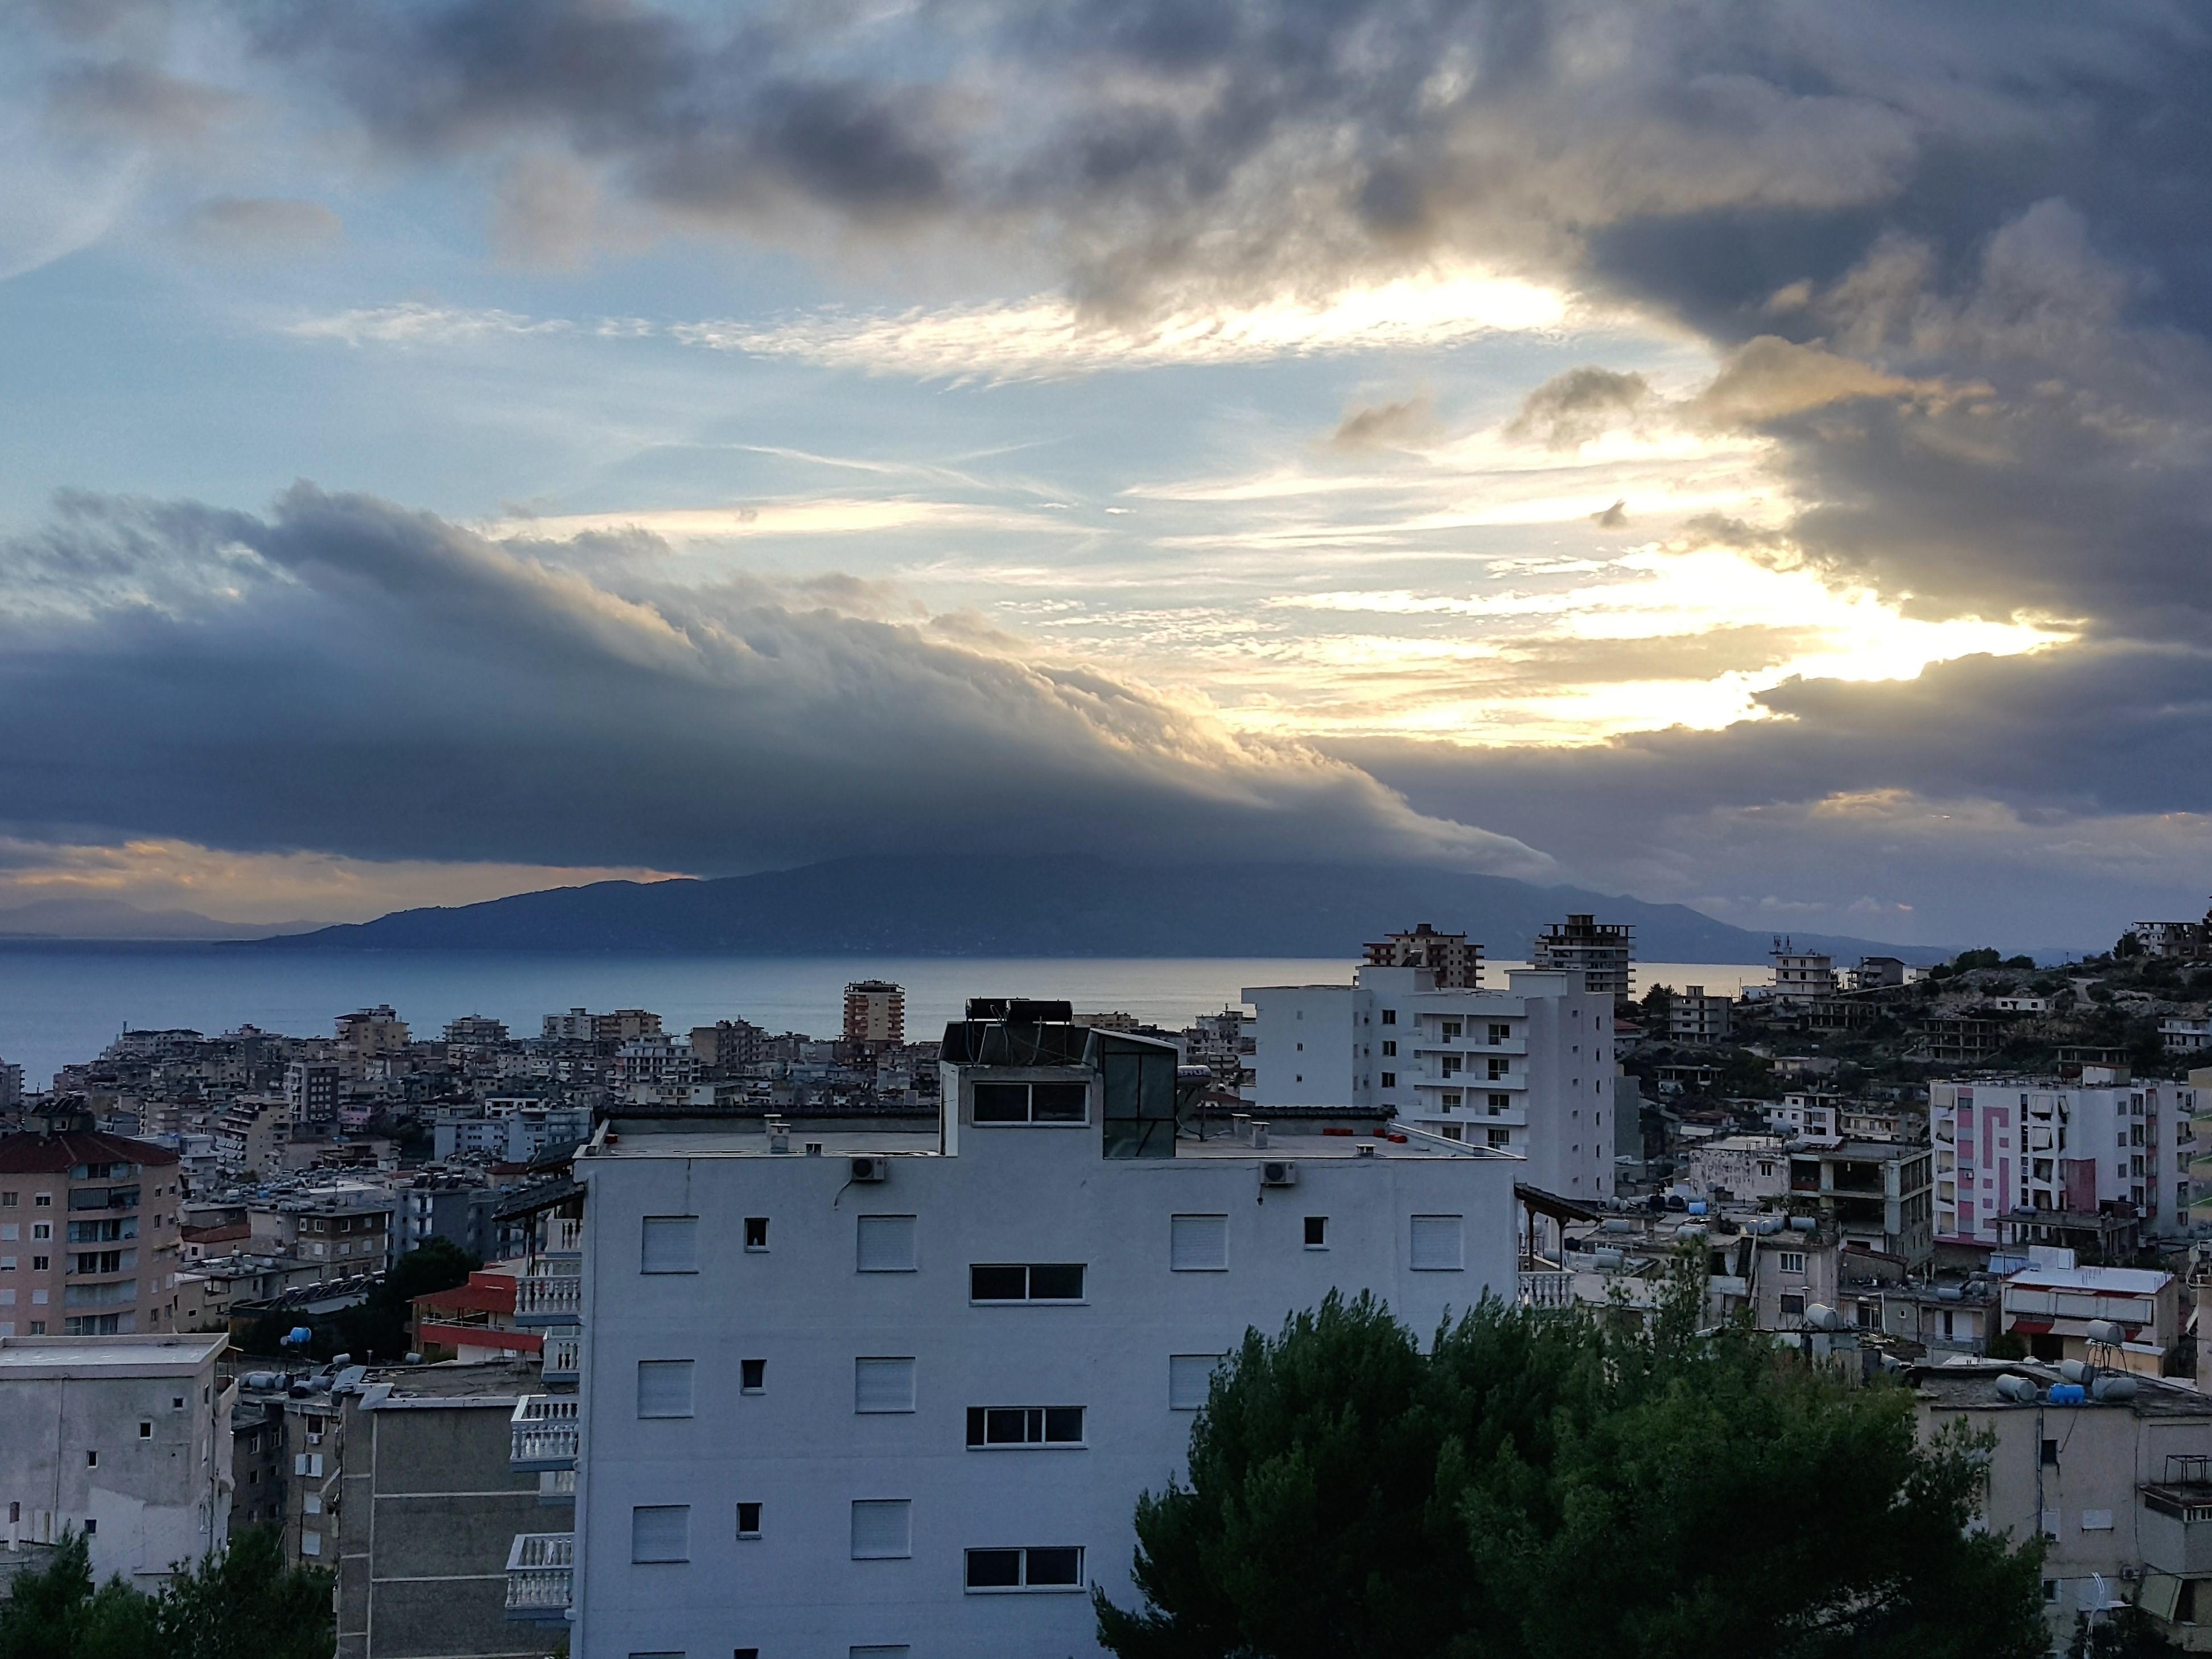 weather in Saranda, Albania @pratserie